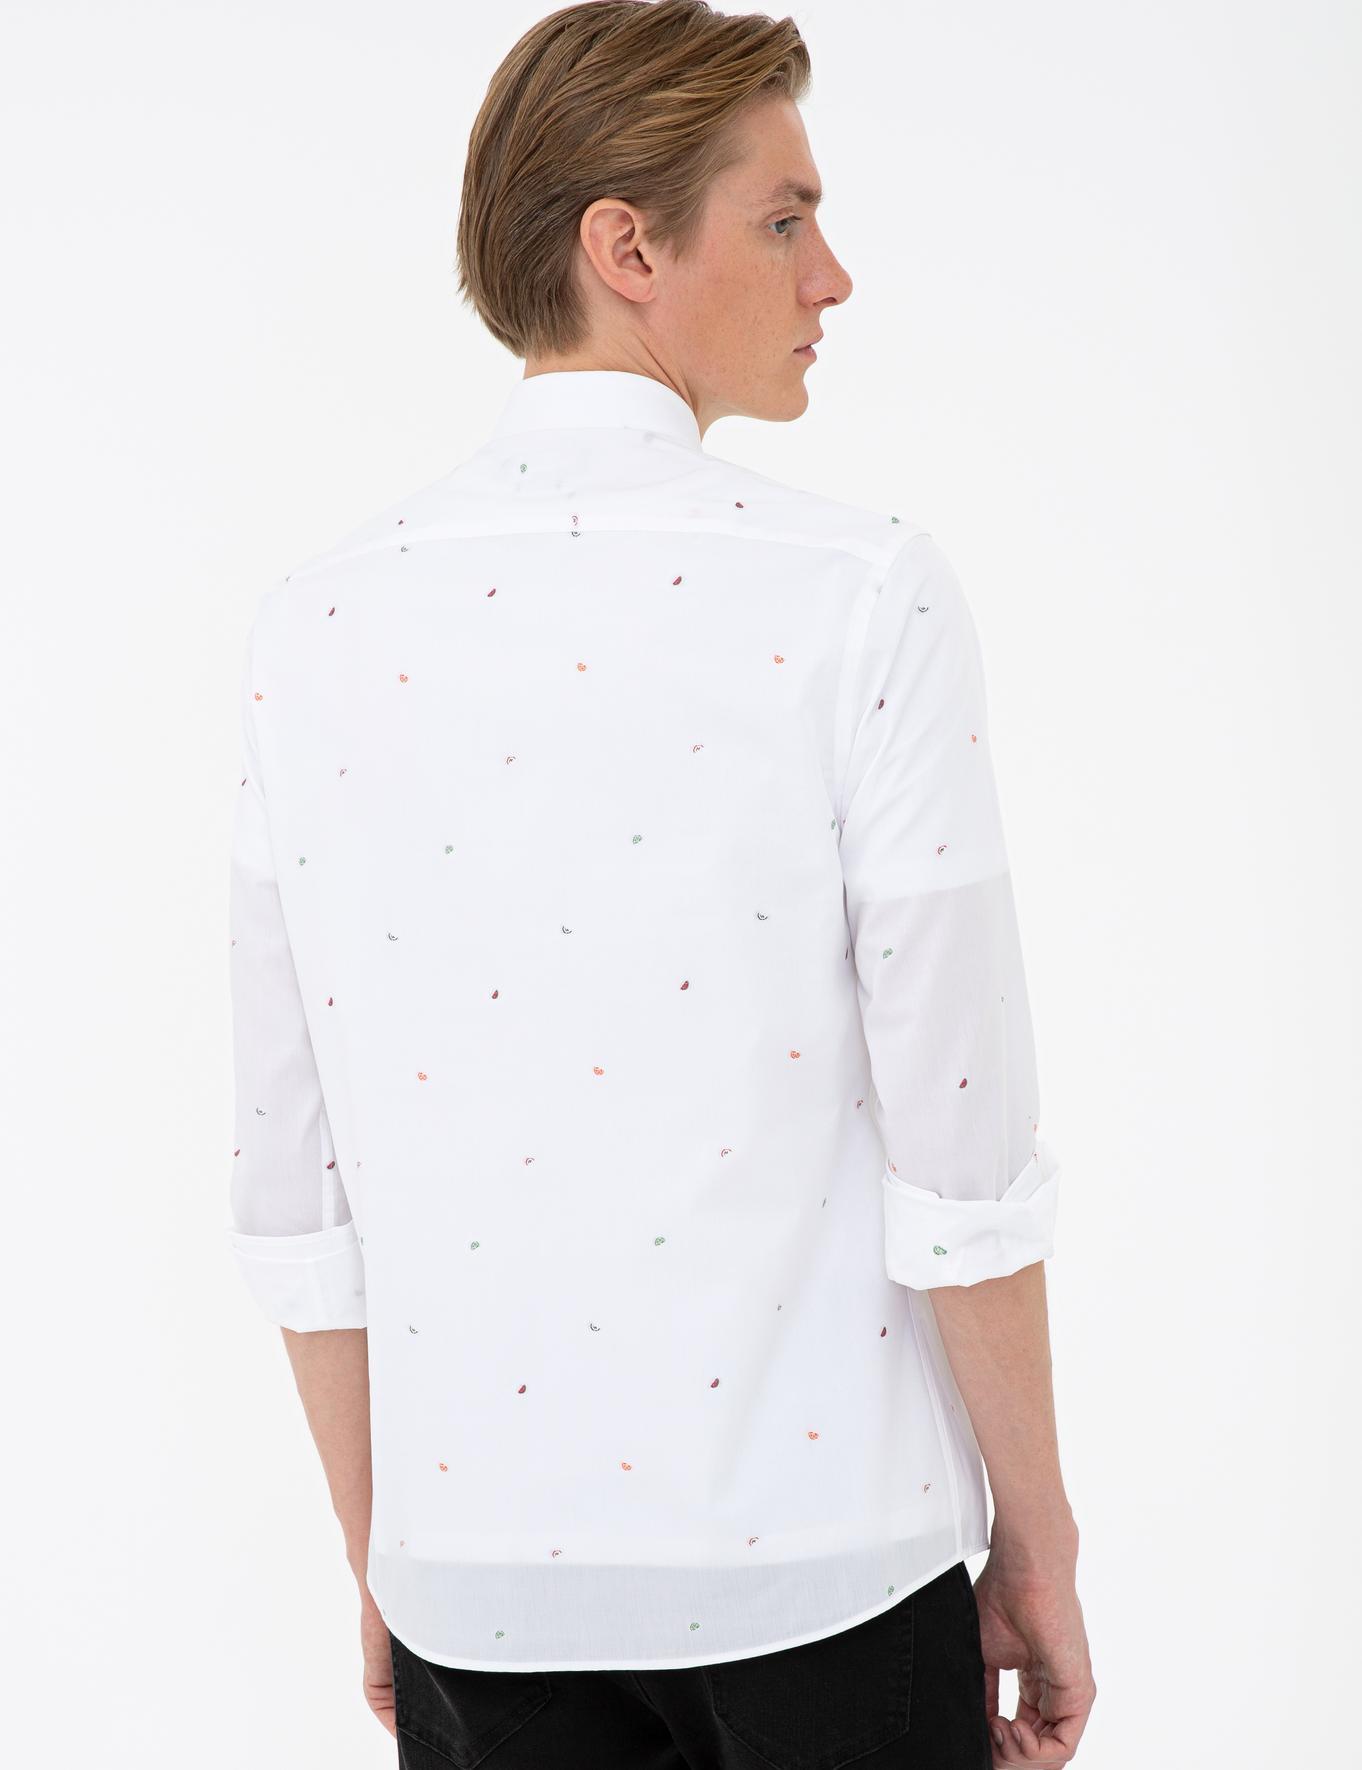 Beyaz Slim Fit Gömlek - 50233199025